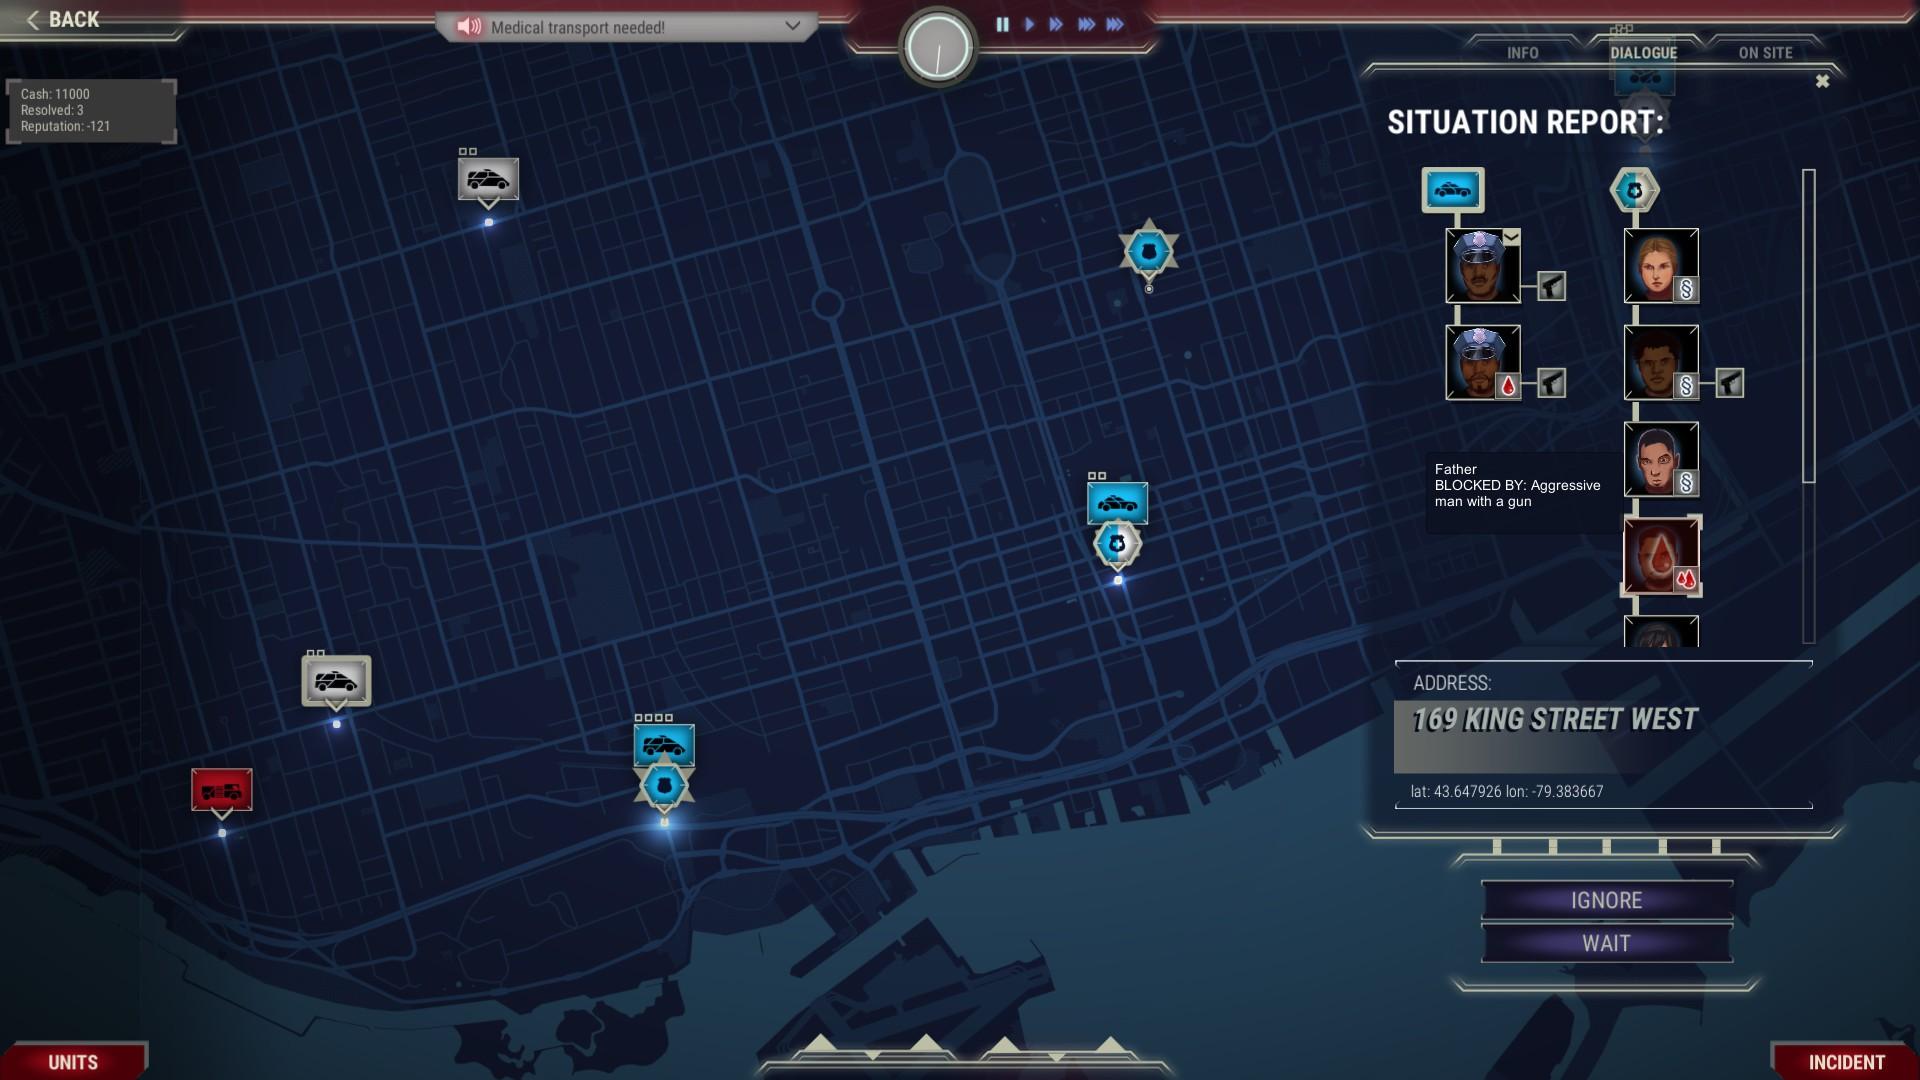 911 Operator screenshot